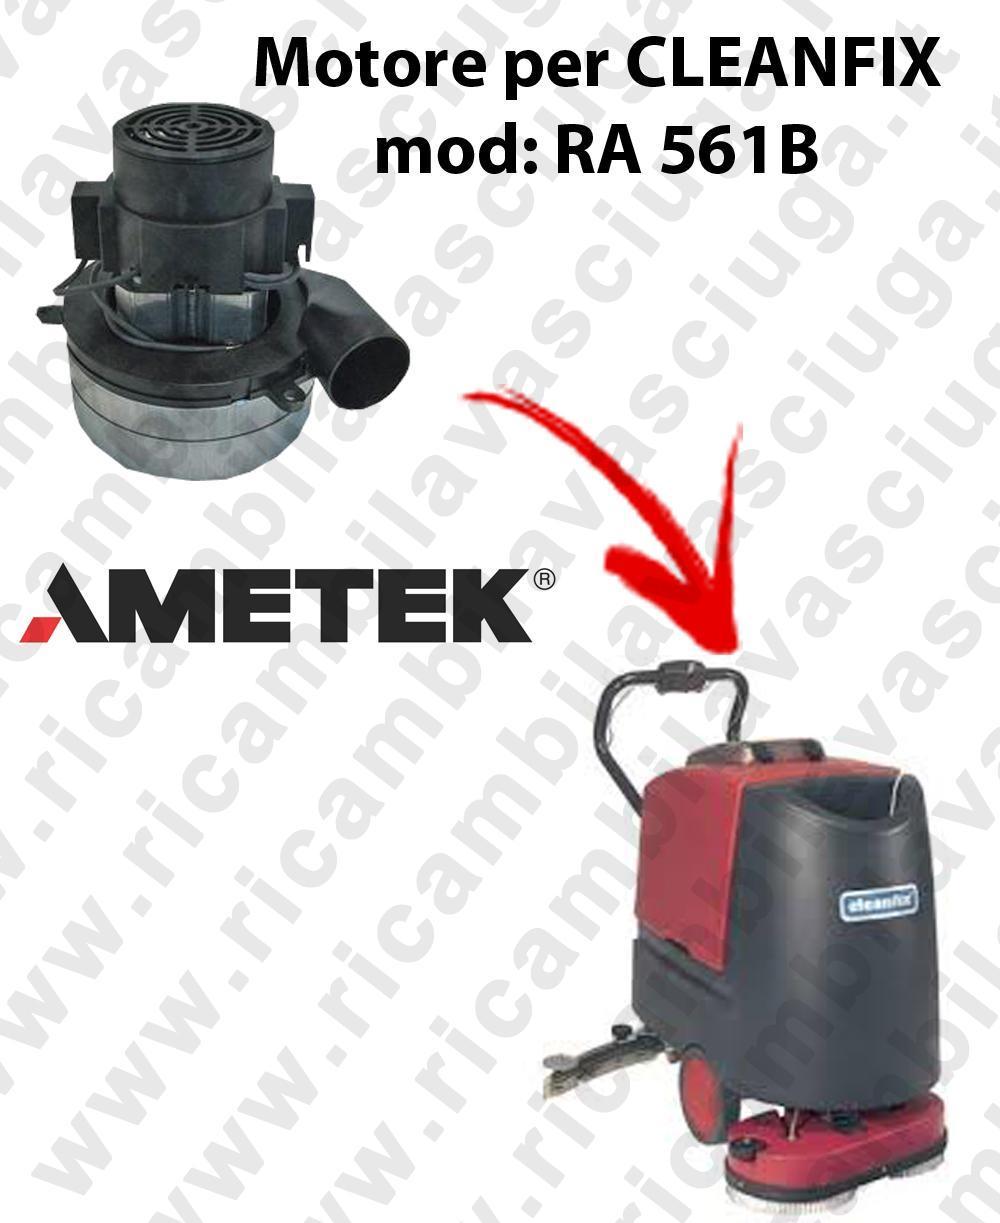 RA 561B Saugmotor AMETEK ITALIA für scheuersaugmaschinen CLEANFIX